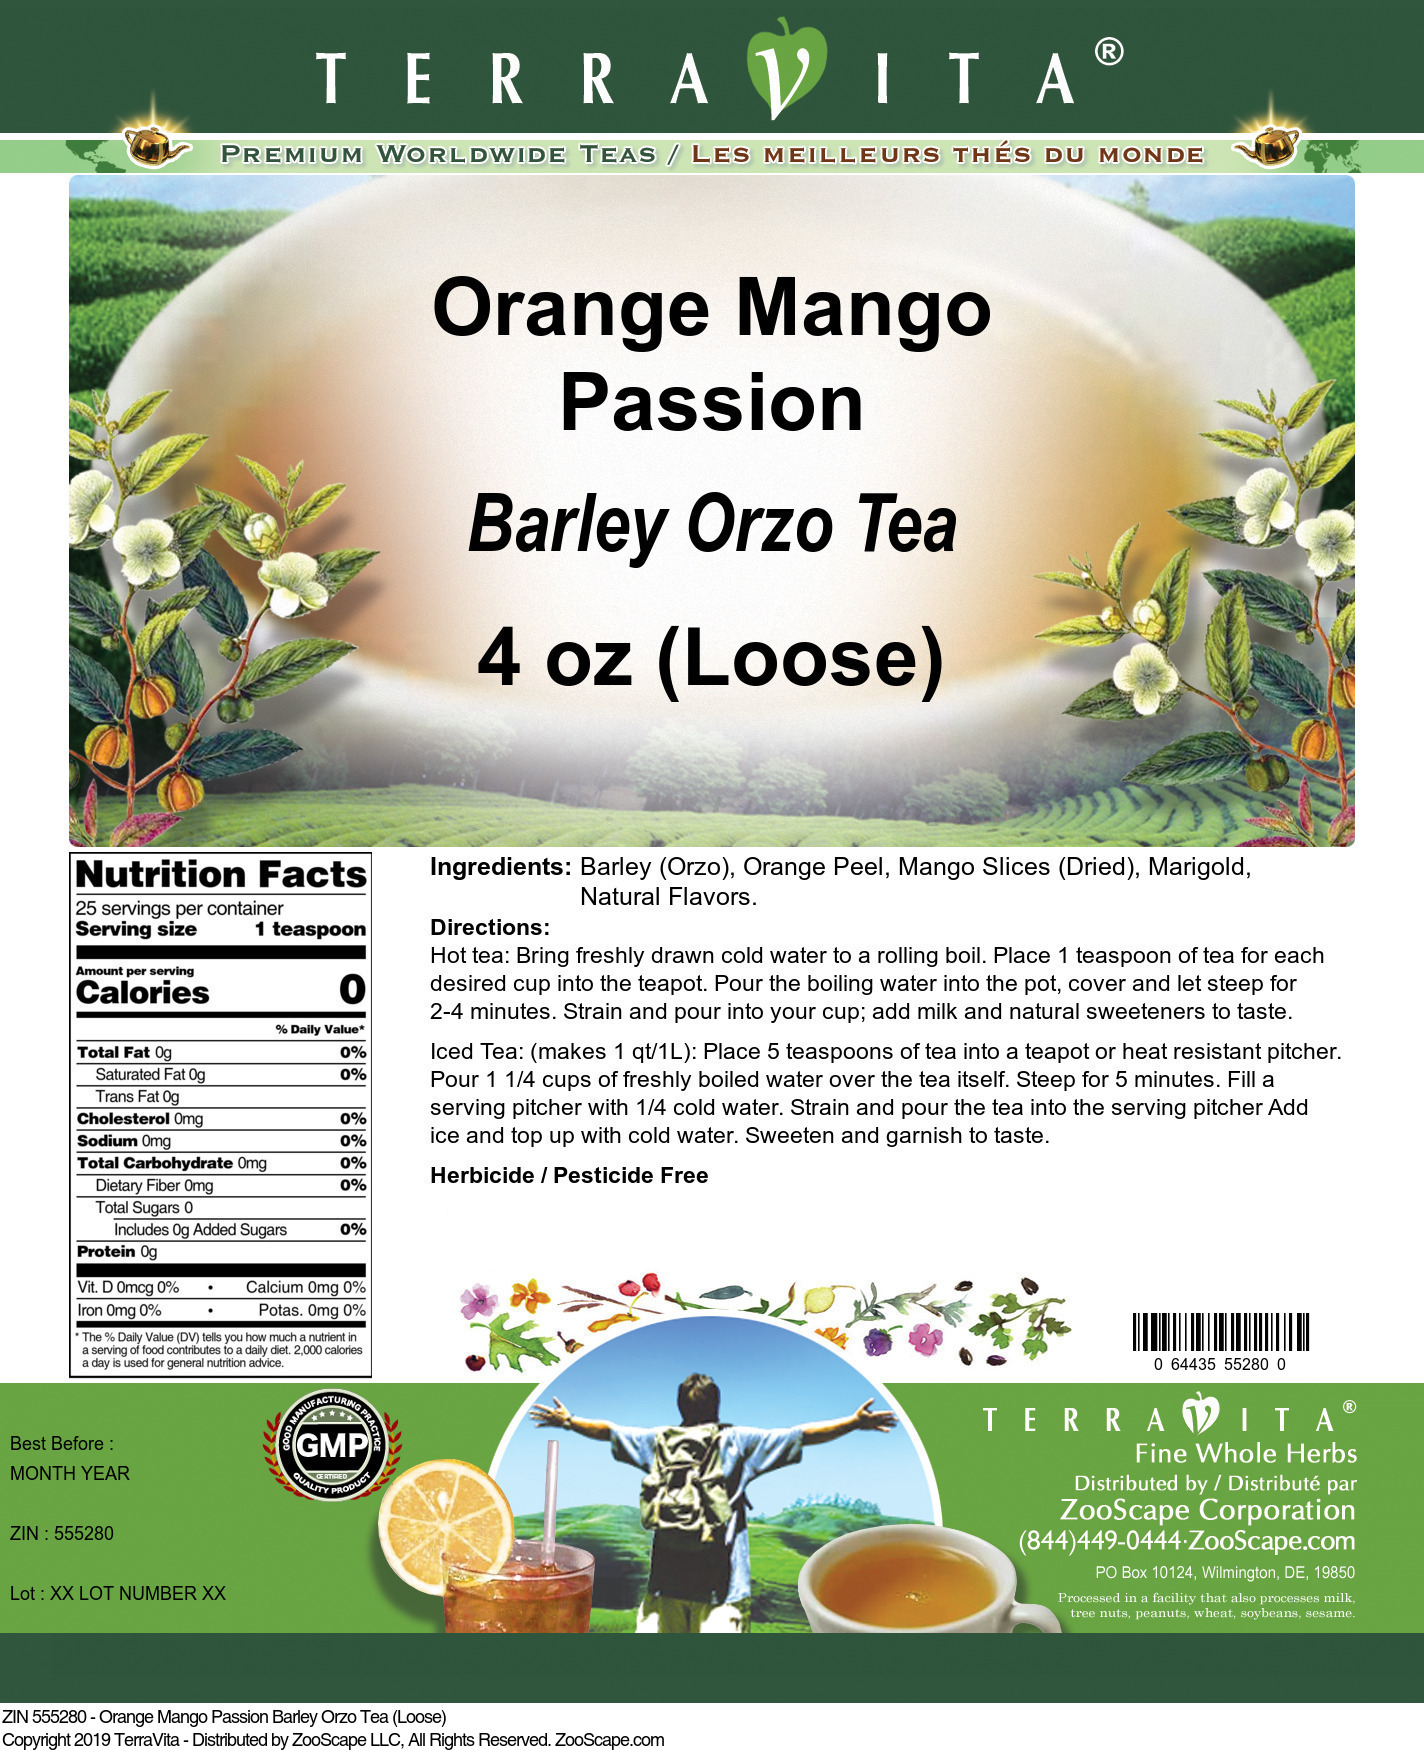 Orange Mango Passion Barley Orzo Tea (Loose)